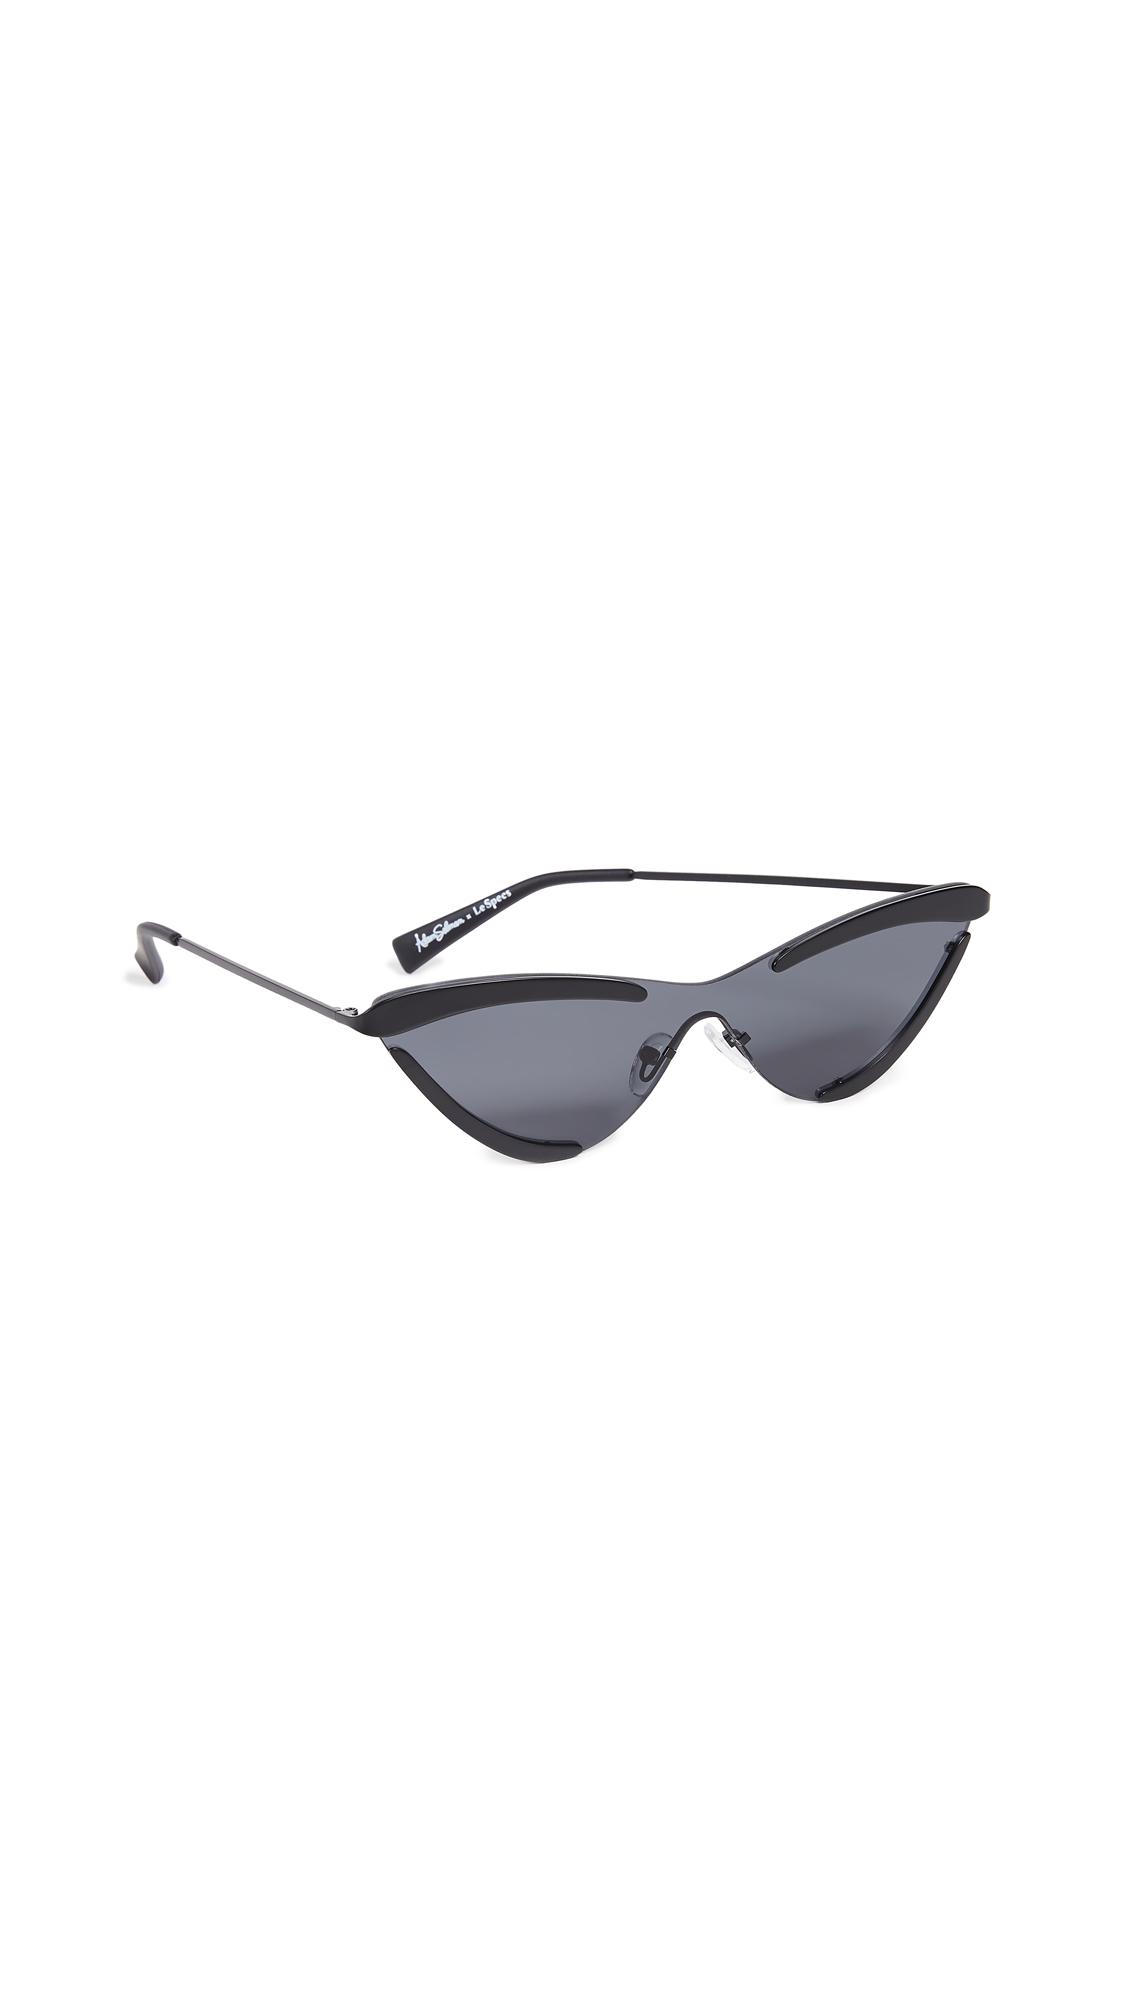 ADAM SELMAN The Scandal Sunglasses in Satin Black